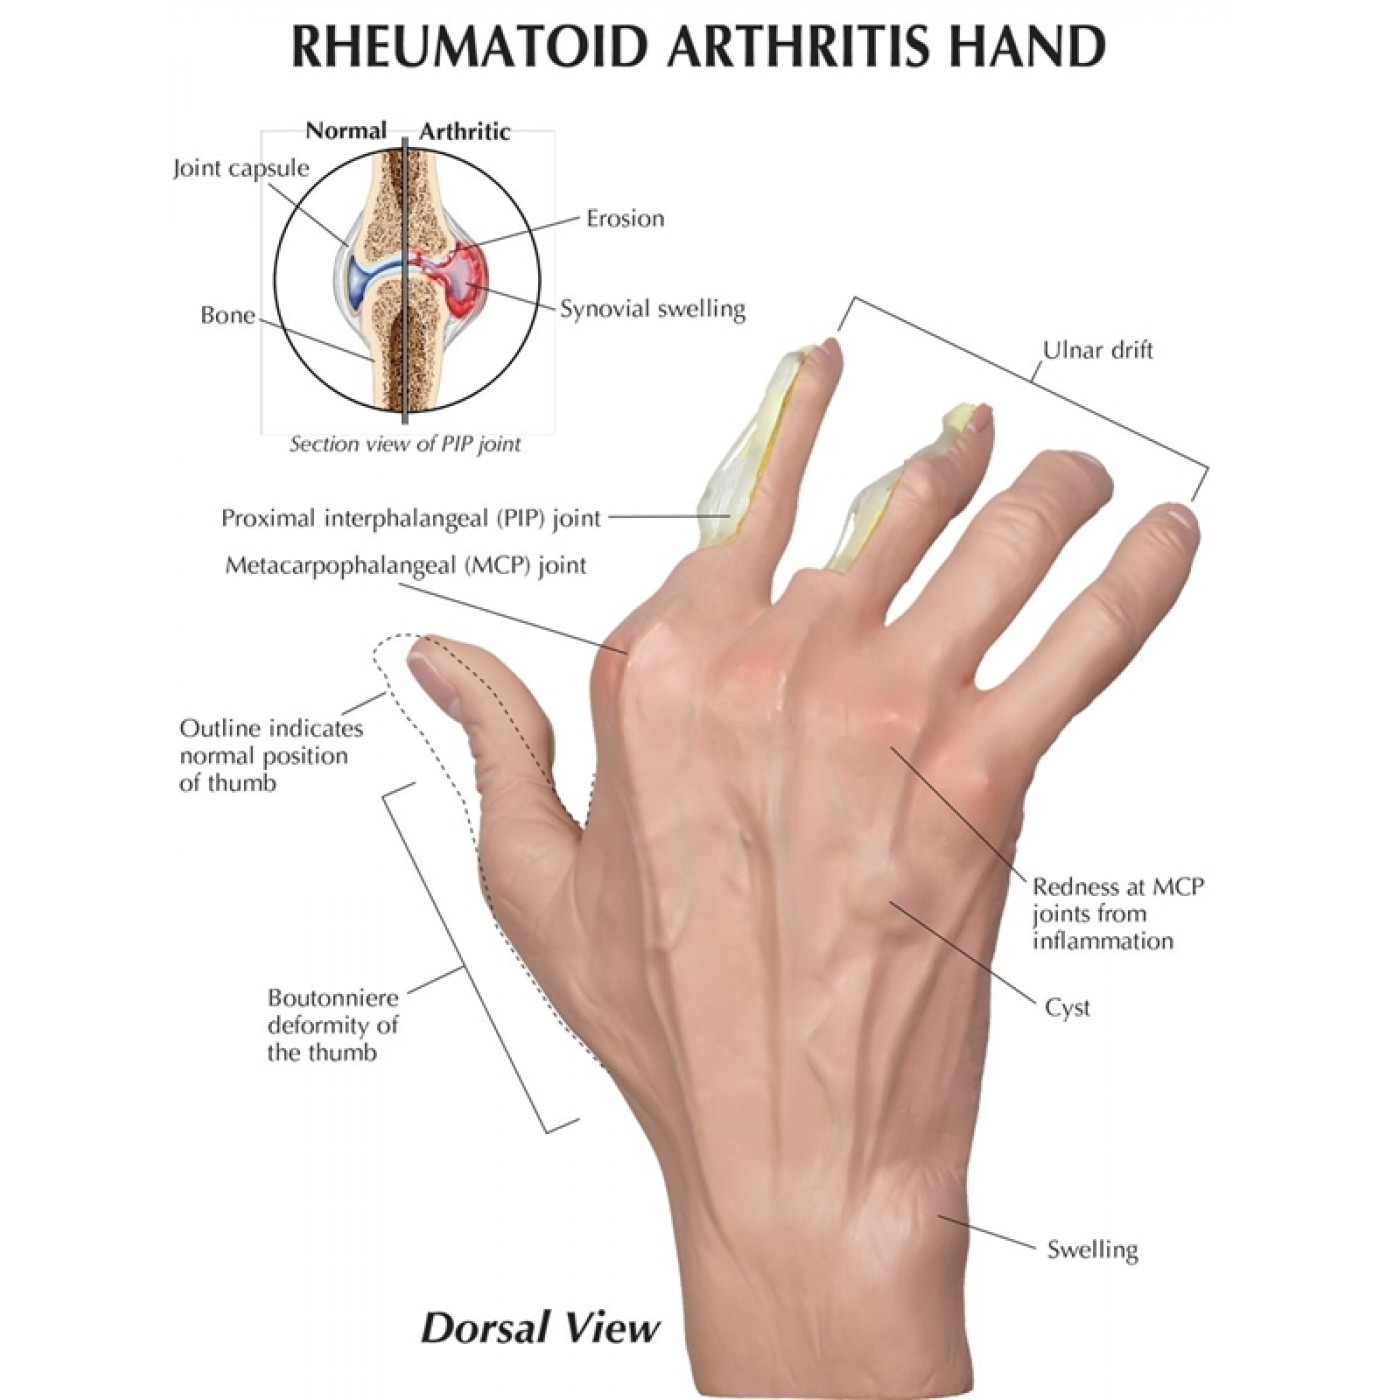 Sex positions and rheumatoid arthritis